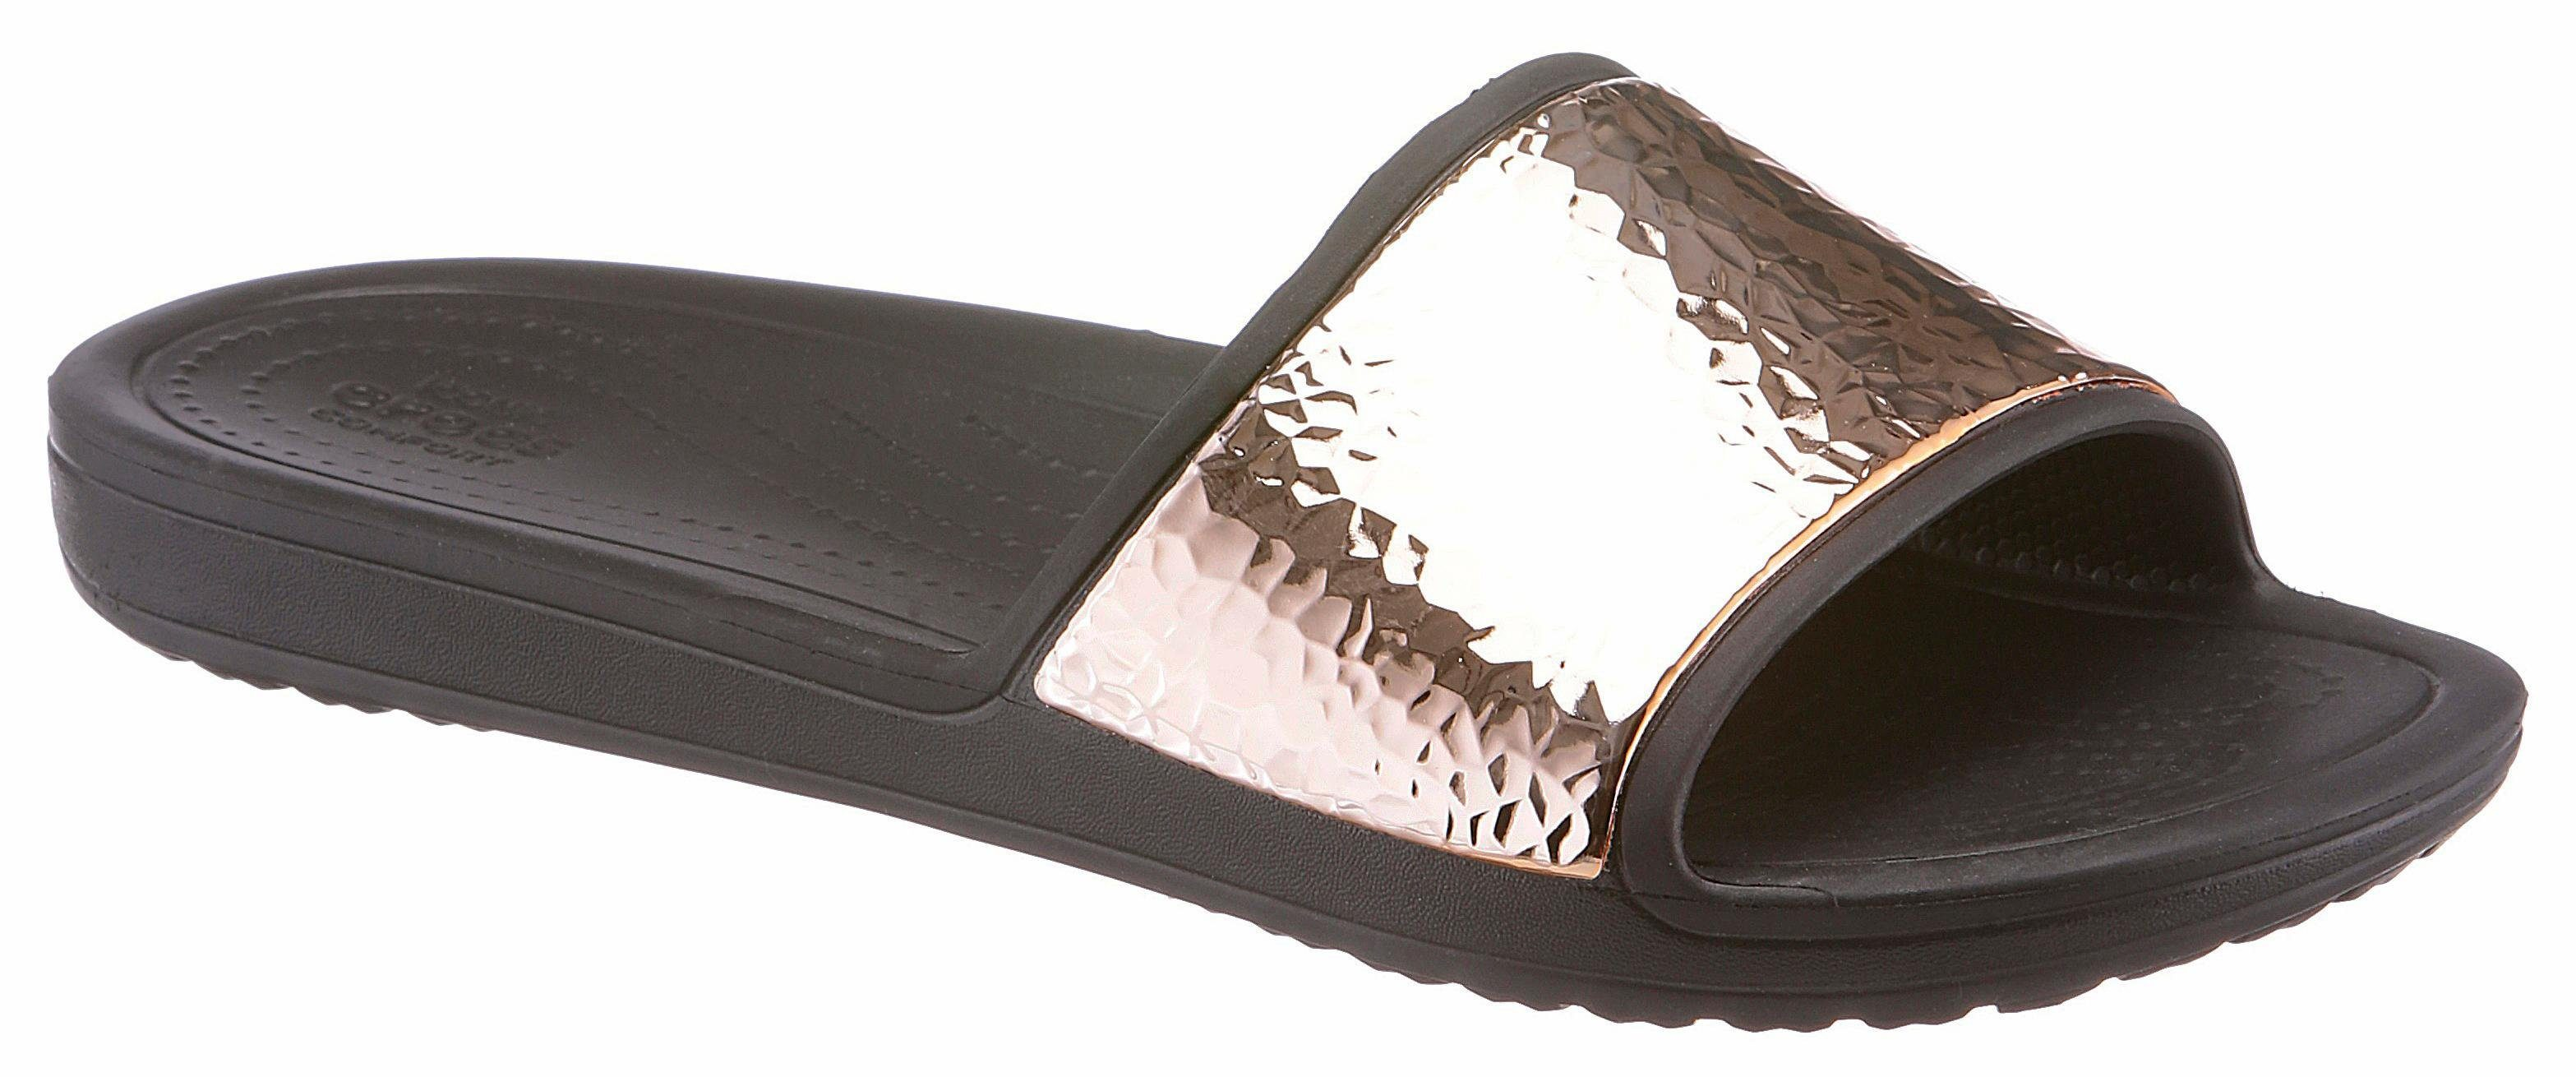 Crocs Sloane Hammered Met Slide Pantolette, mit metallischer Verzierung online kaufen  rosé